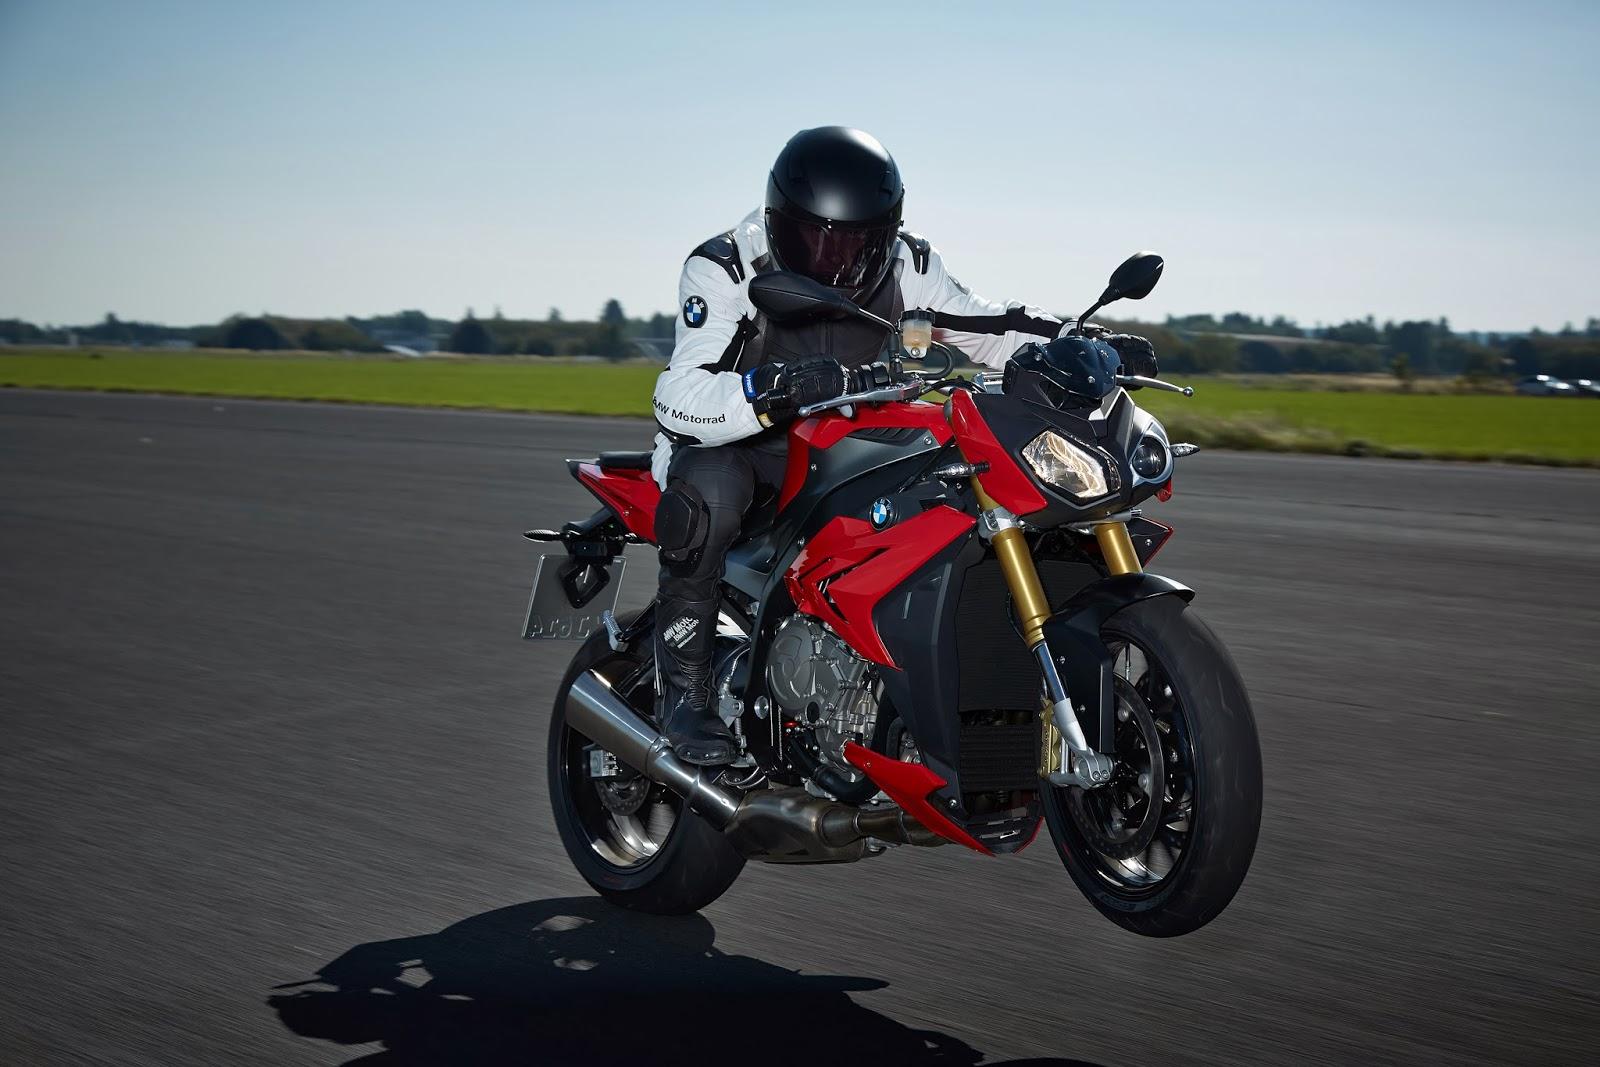 Jornal do Motociclista: BMW S1000R - A naked roadster